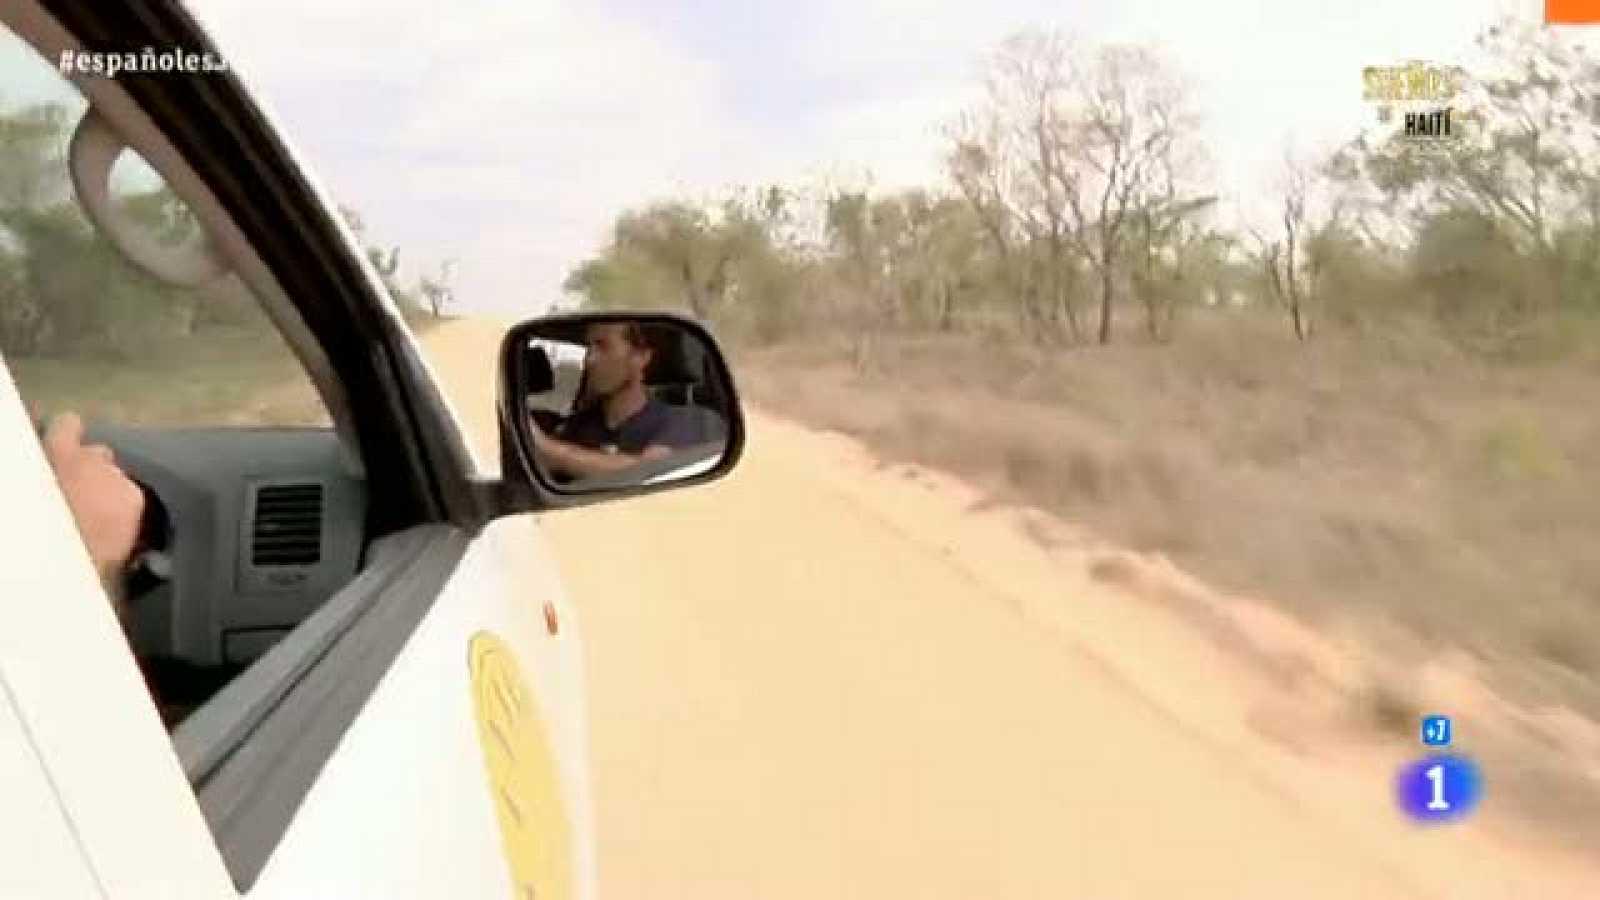 Visitamos el Parque Kruger cerca de Johannesburgo